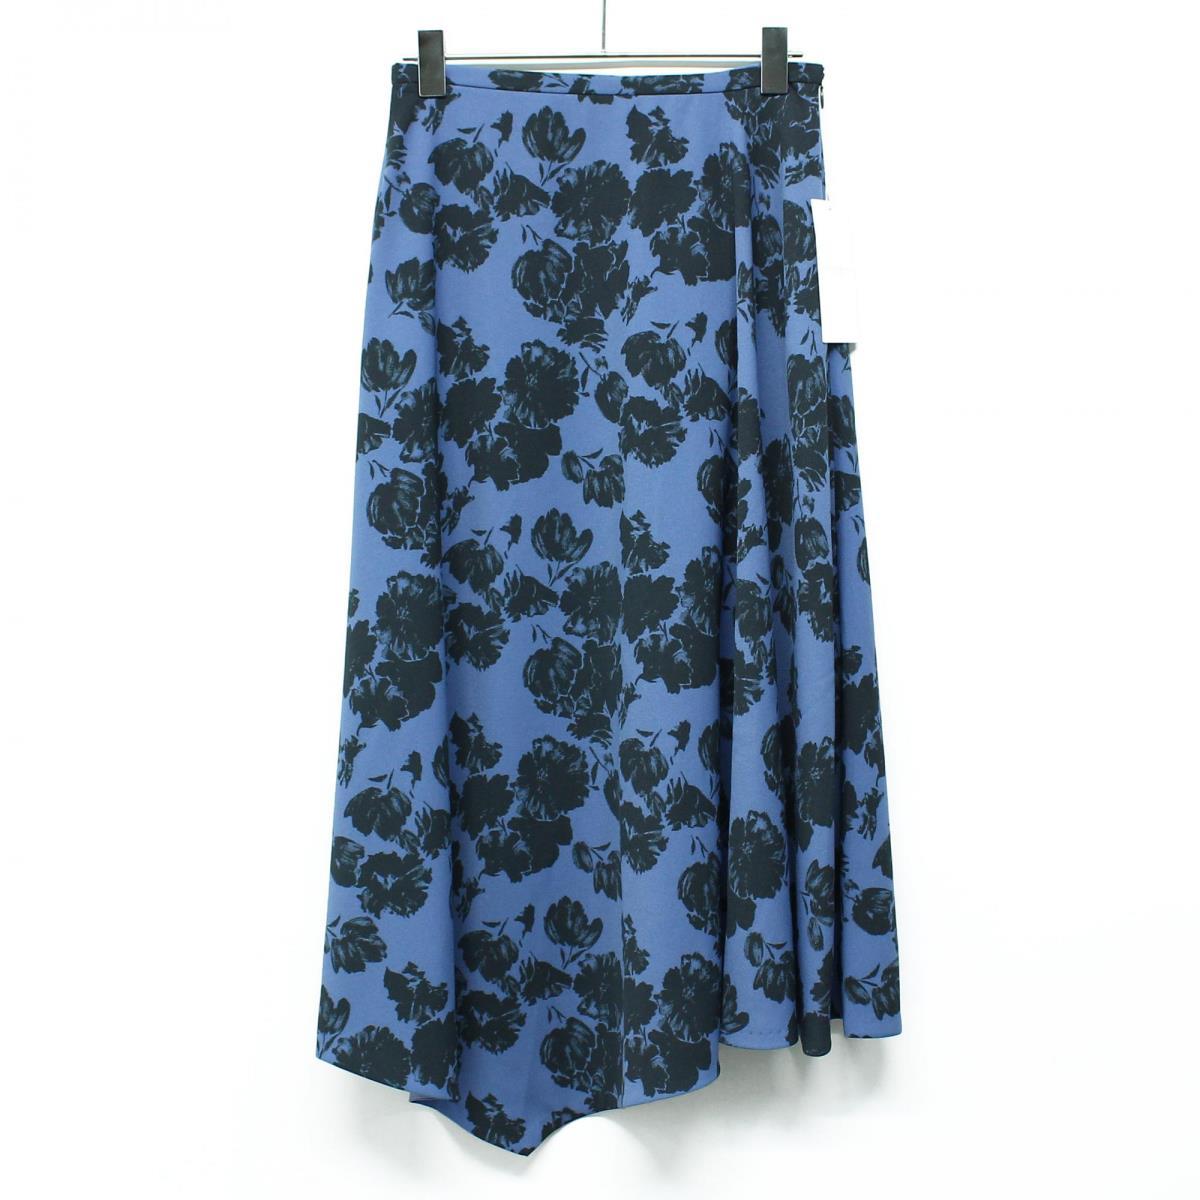 TOMORROWLAND トゥモローランド スカート フラワープリント アシンメトリー フレアスカート 20春夏 ブルー×ブラック 34(7号) 【レディース】【K2608】